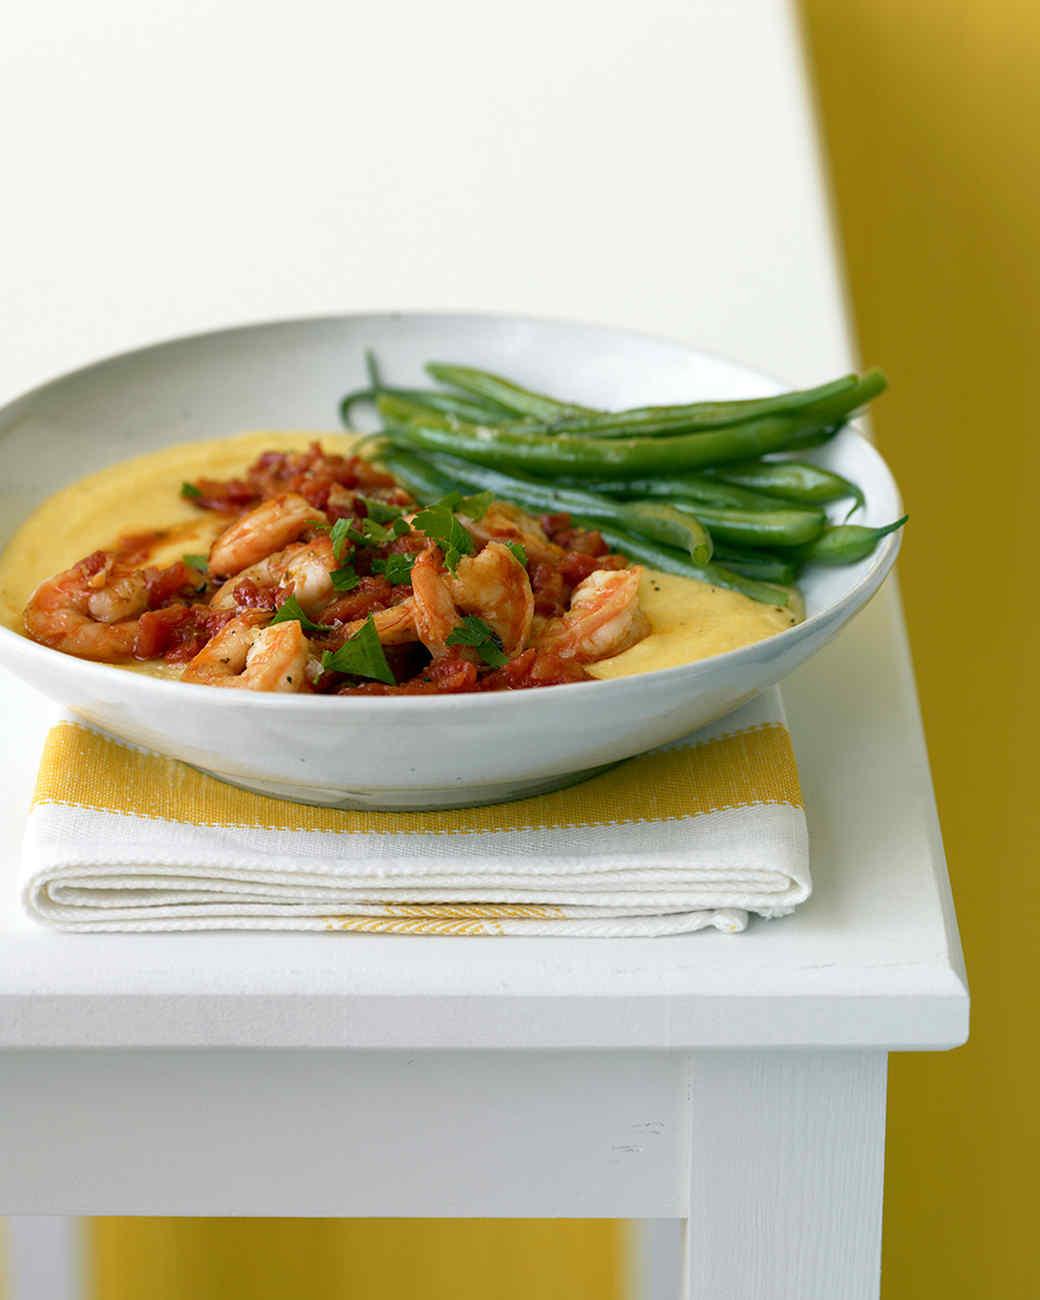 Shrimp and Tomatoes over Soft Polenta